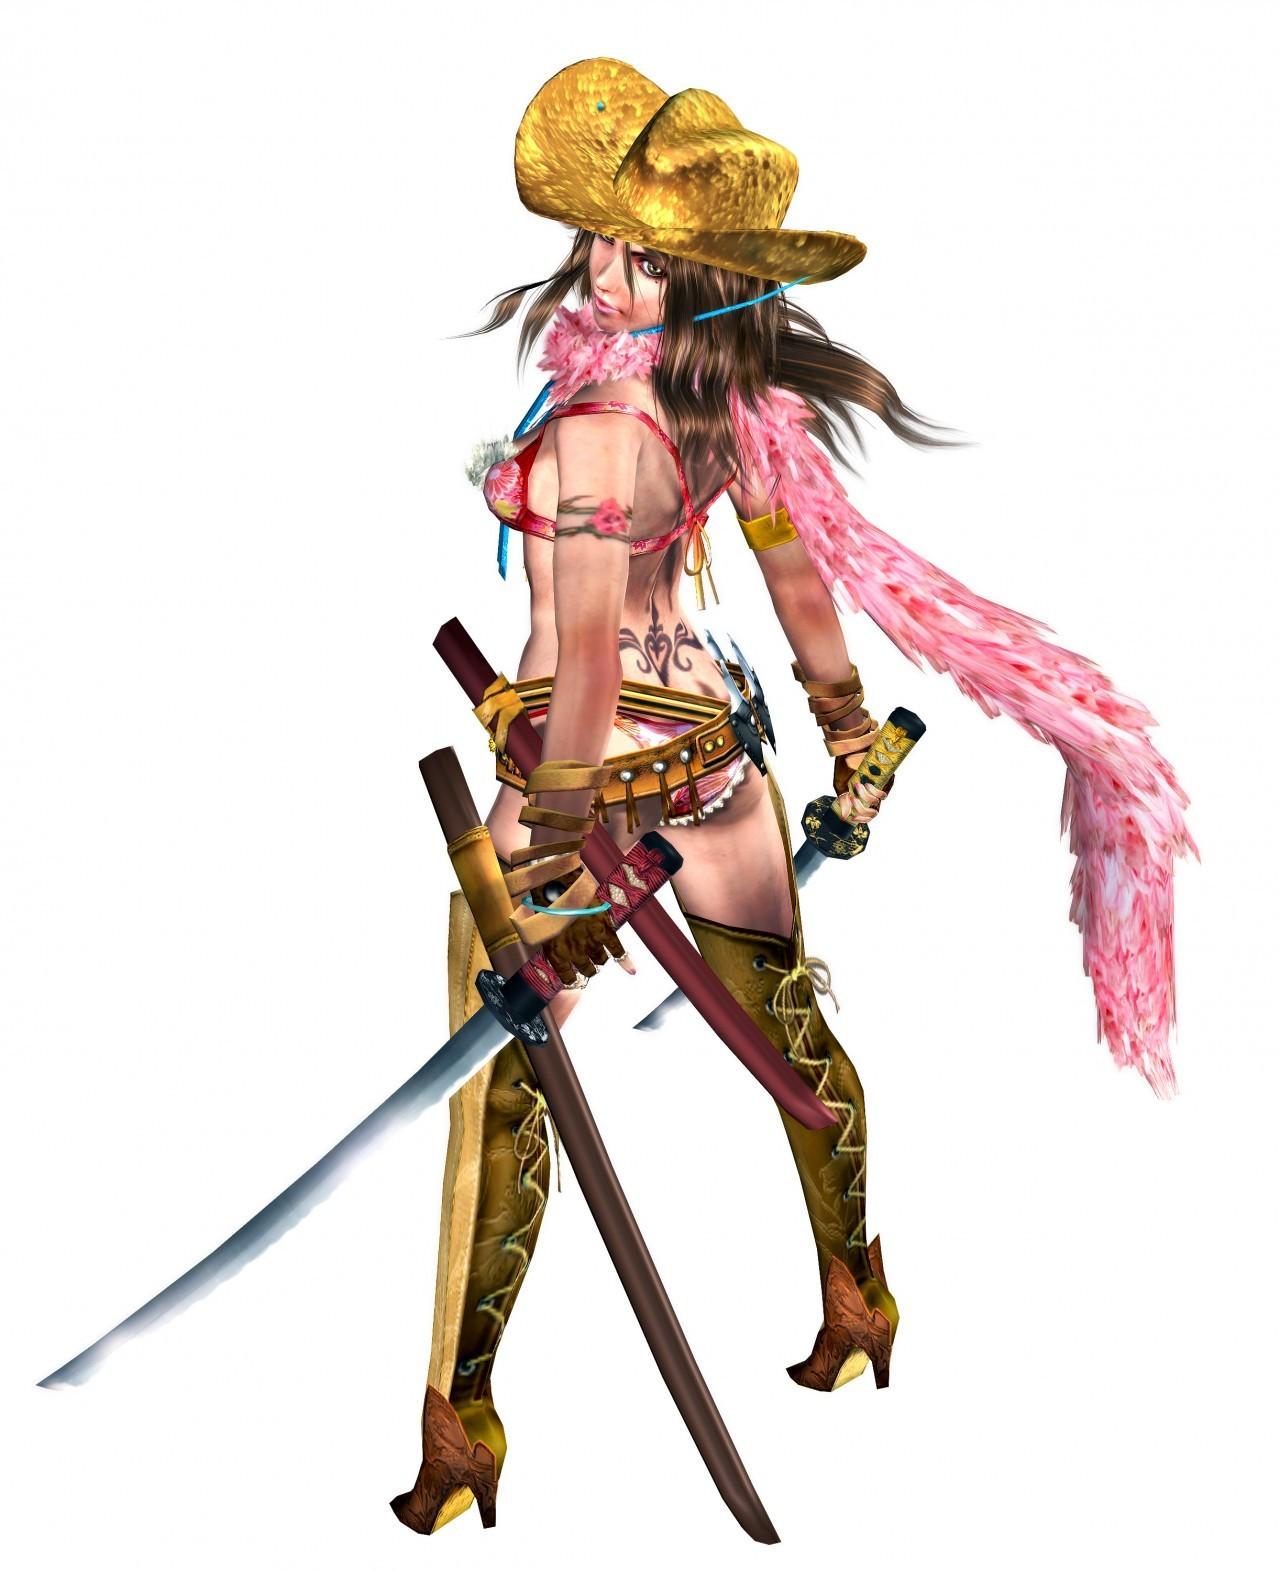 Onechanbara : Bikini Samurai Squad - Le titre arrive en